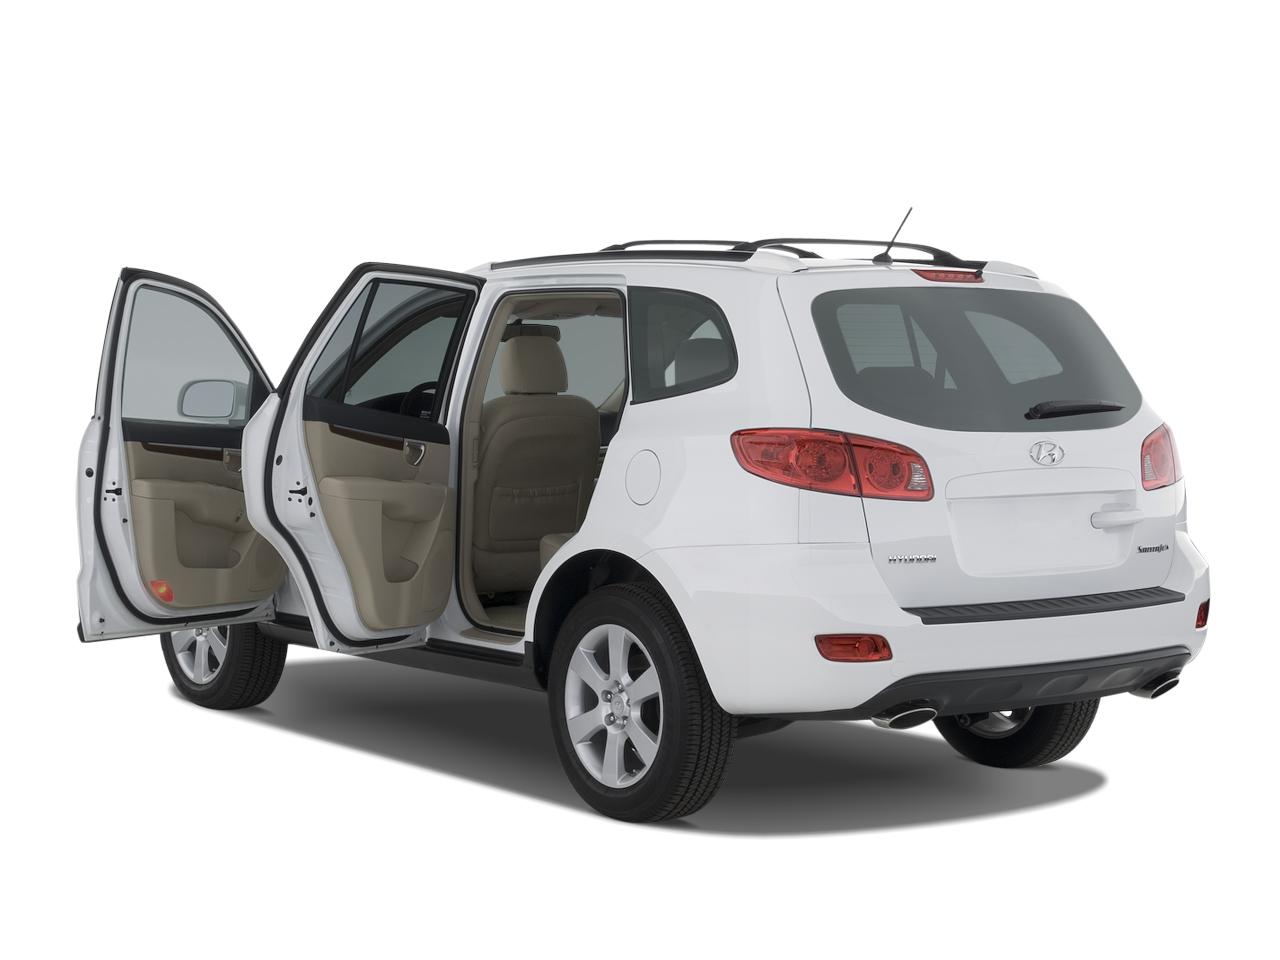 2007 hyundai santa fe car review road test automobile magazine. Black Bedroom Furniture Sets. Home Design Ideas